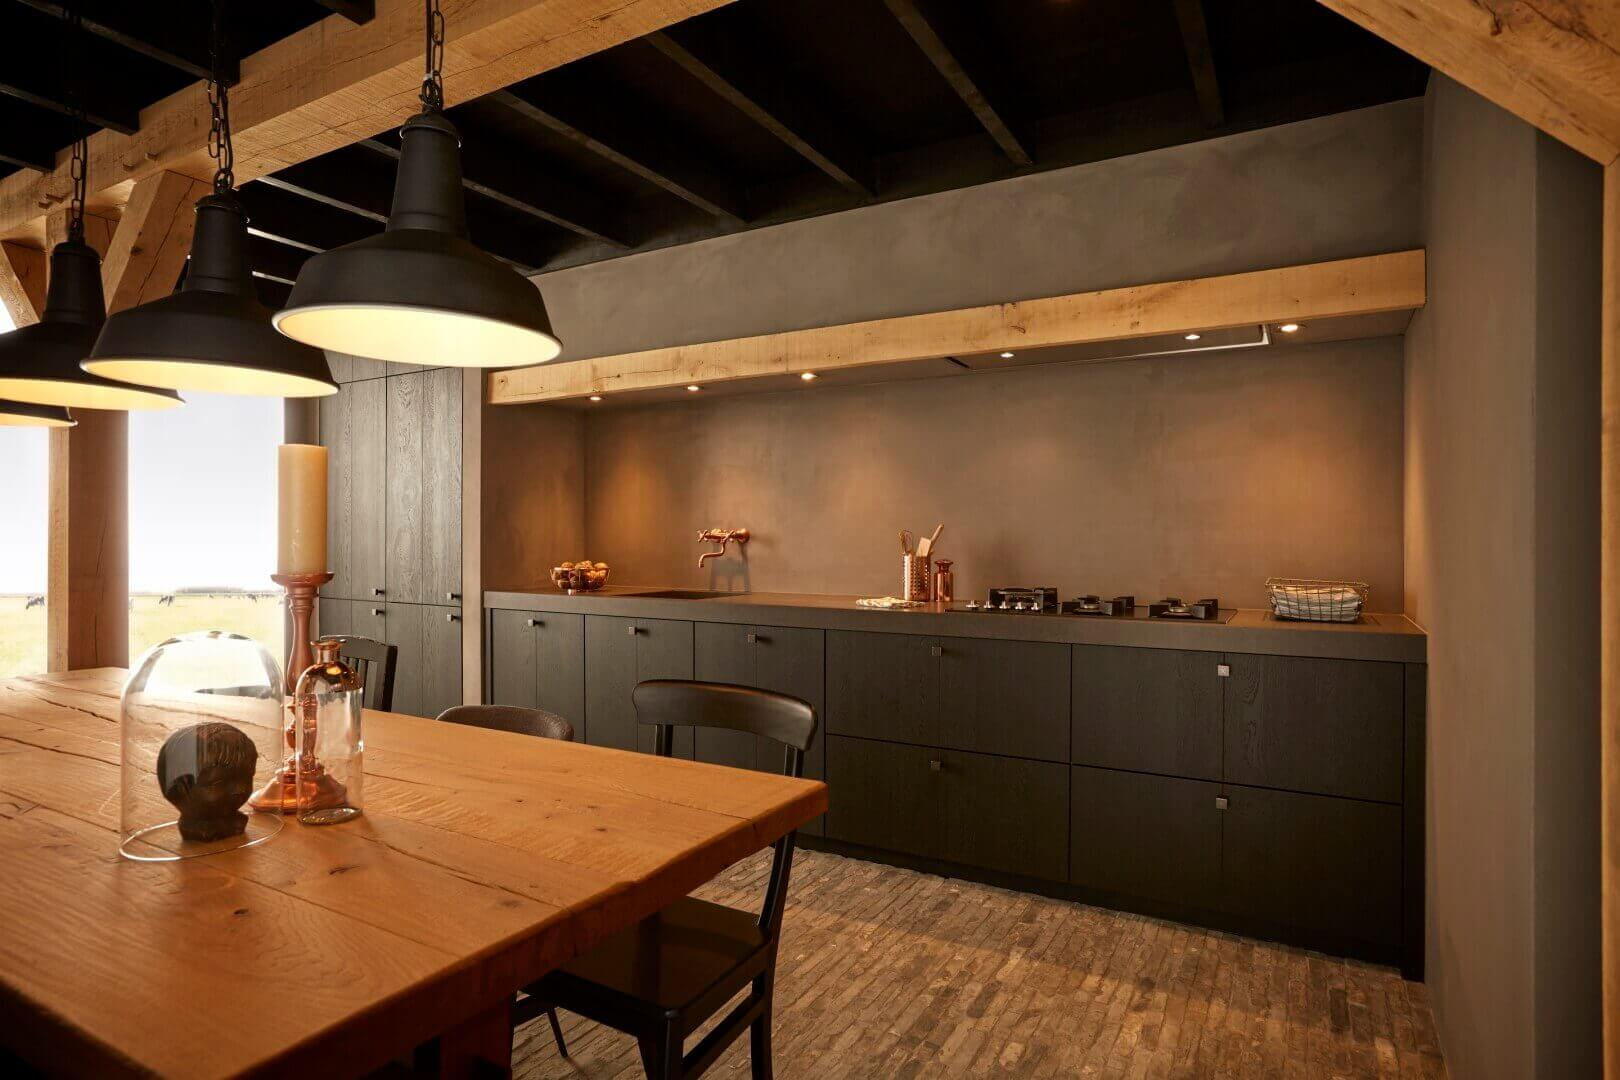 Stoere keukens van Tieleman keukens